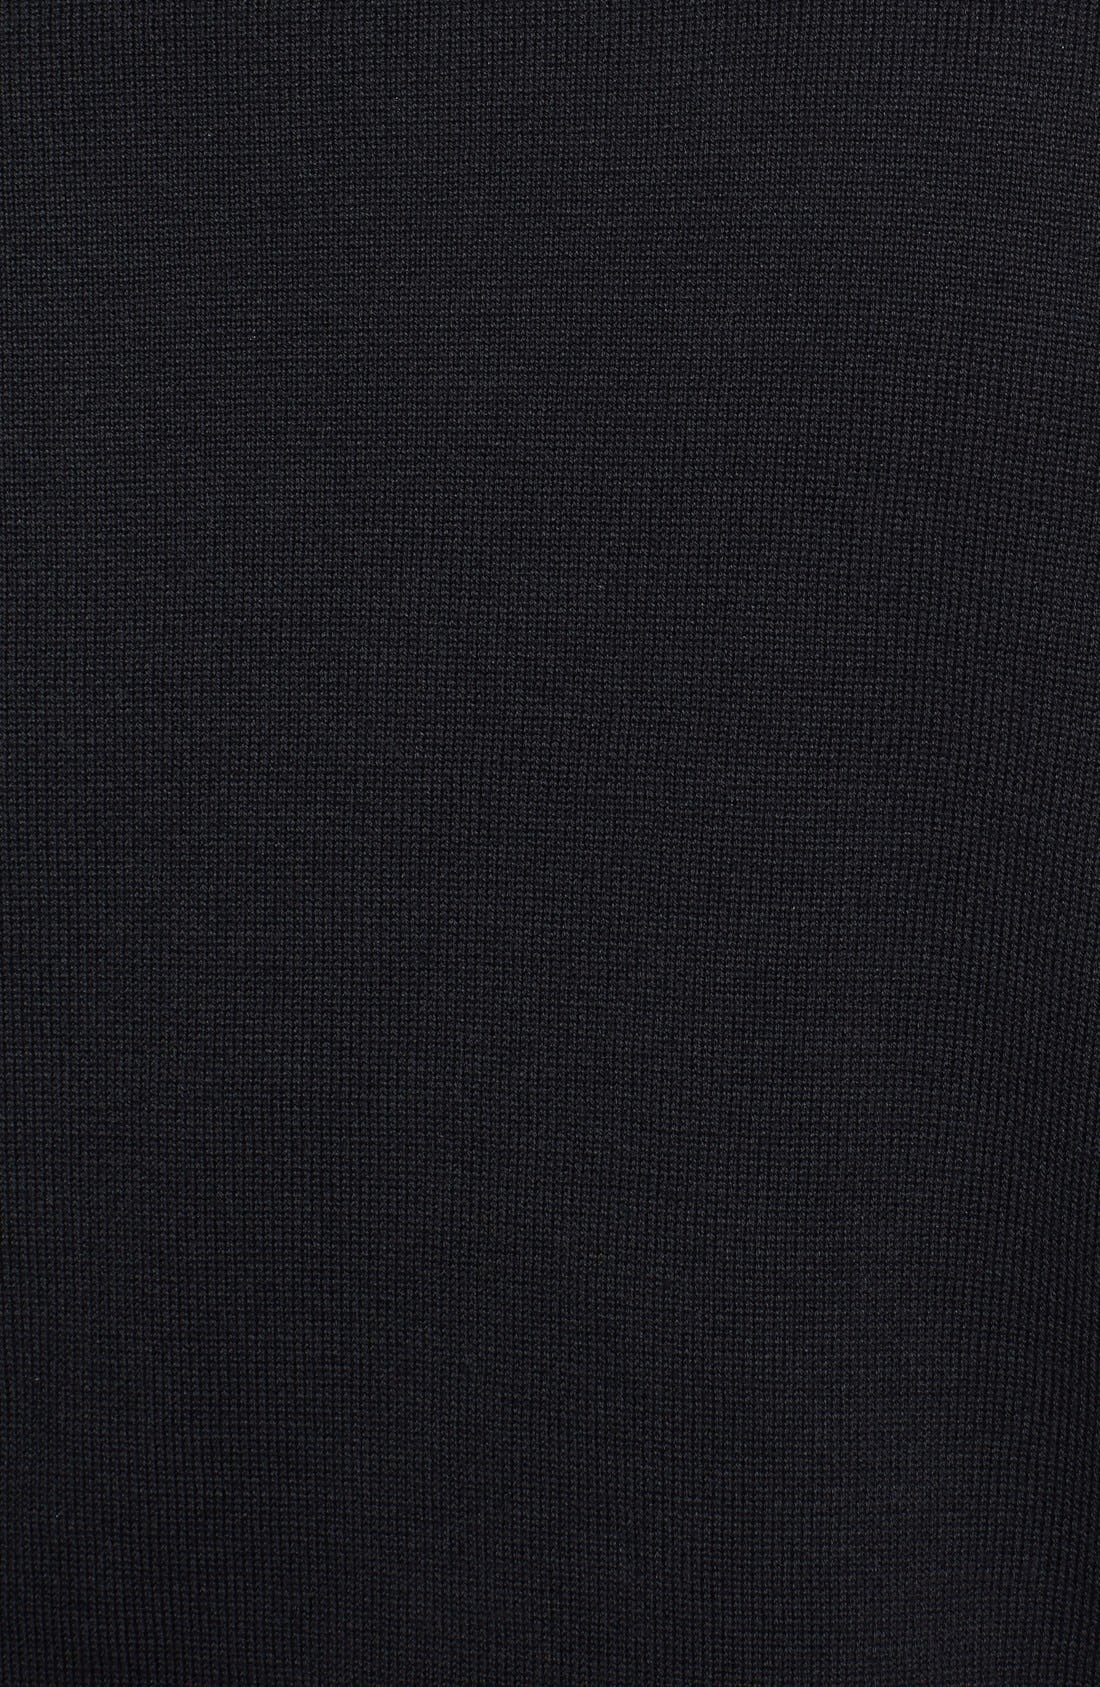 Broadview V-Neck Sweater Vest,                             Alternate thumbnail 6, color,